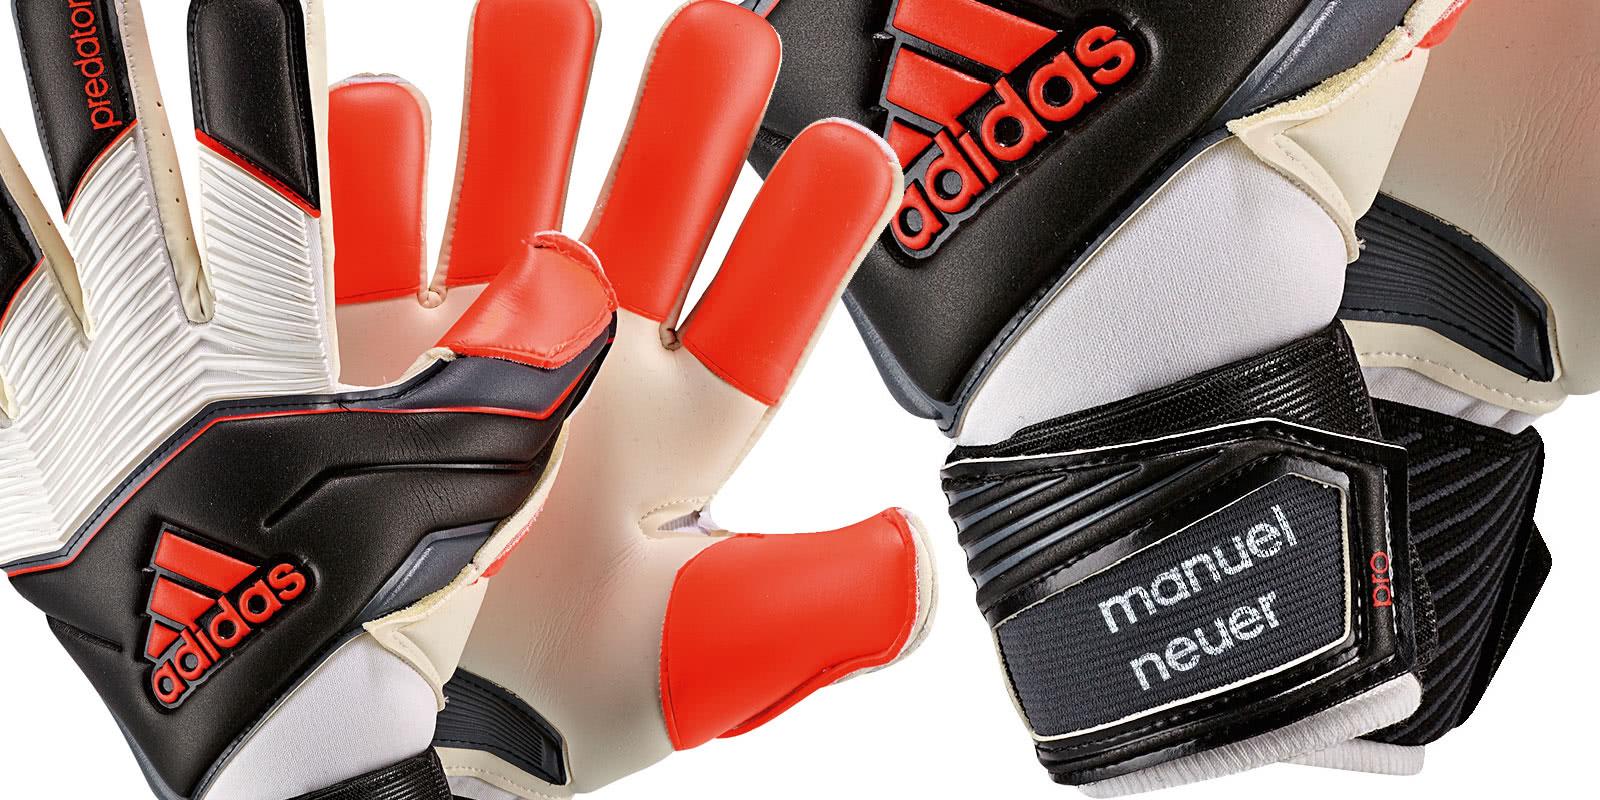 b52b3acfbeab ... hot pro iker casillas adidas predator tw handschuhe a3ab6 e7a3f